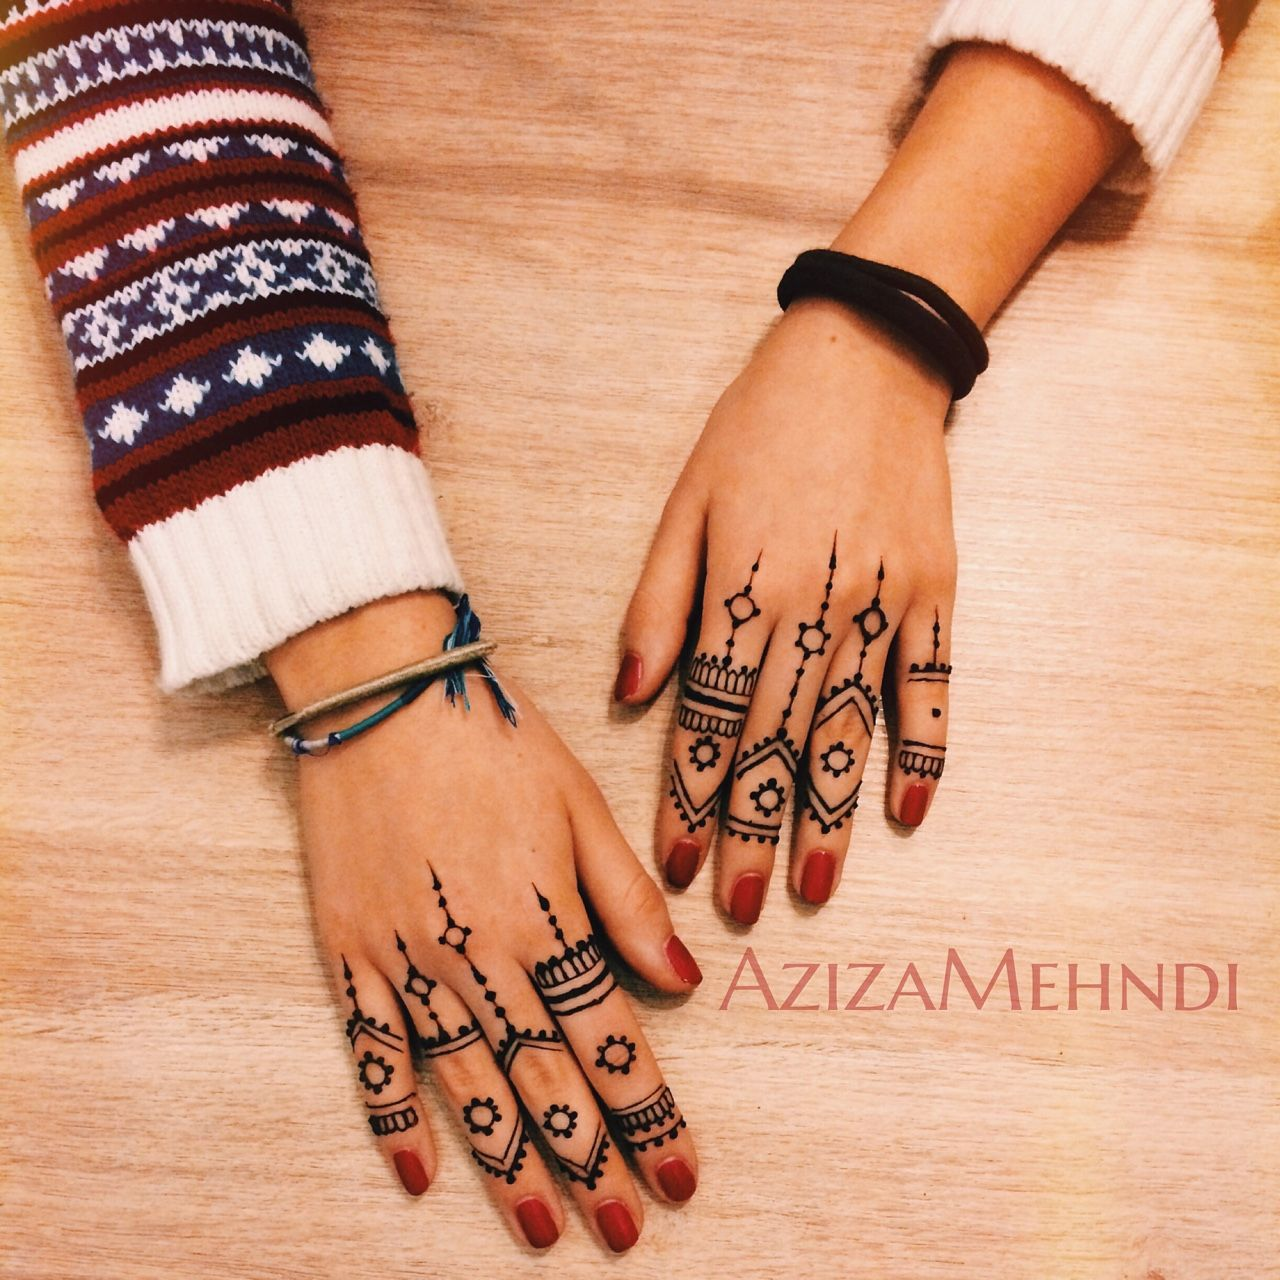 Pin By Fatima Hamed On Henna Glamour Henna Mehndi Henna Designs